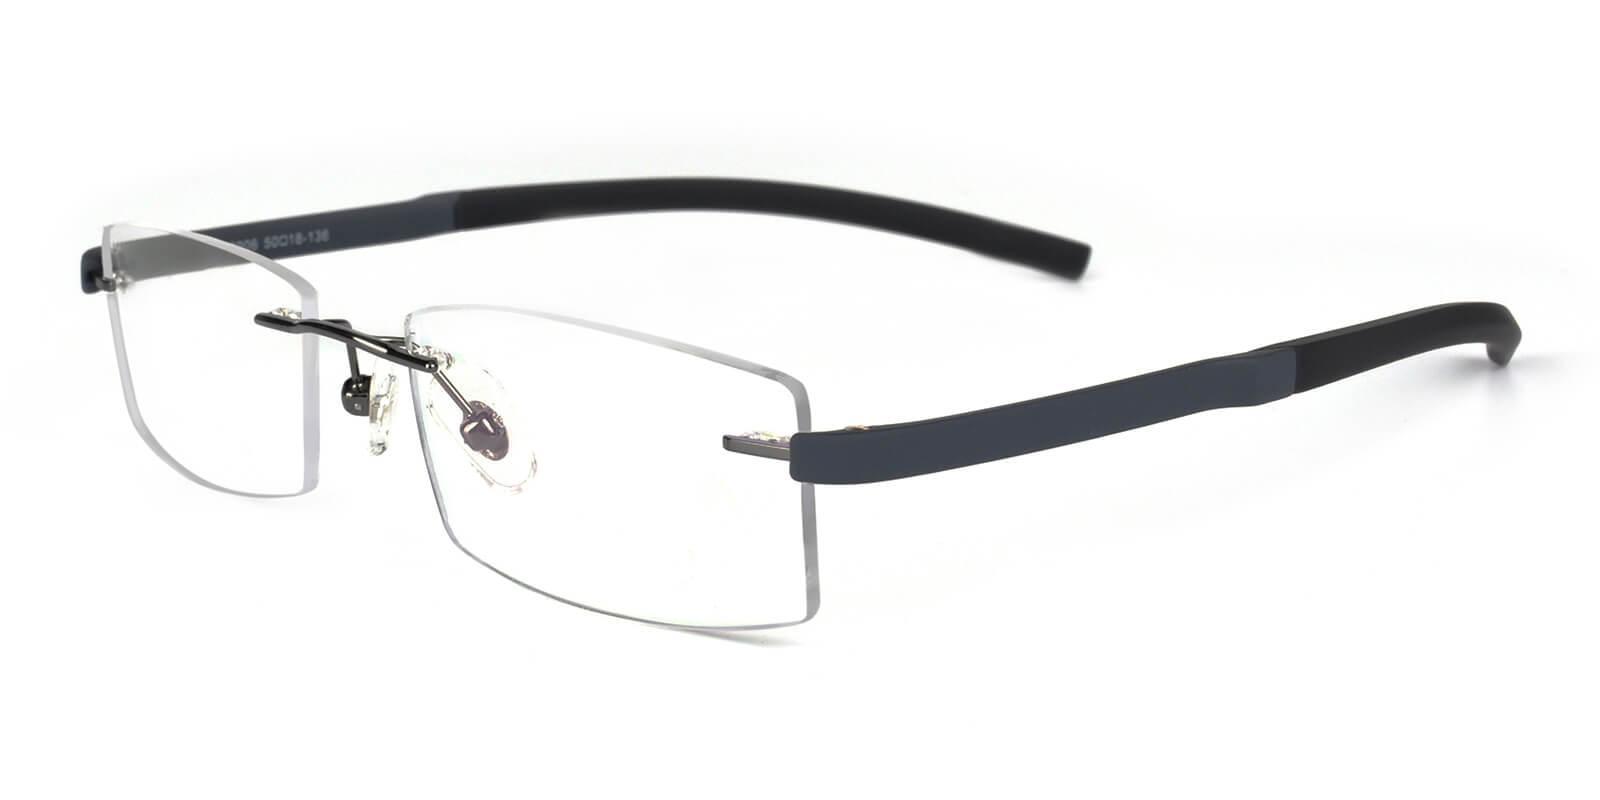 Trimming-Gray-Varieties-Acetate / Metal-Eyeglasses-additional1